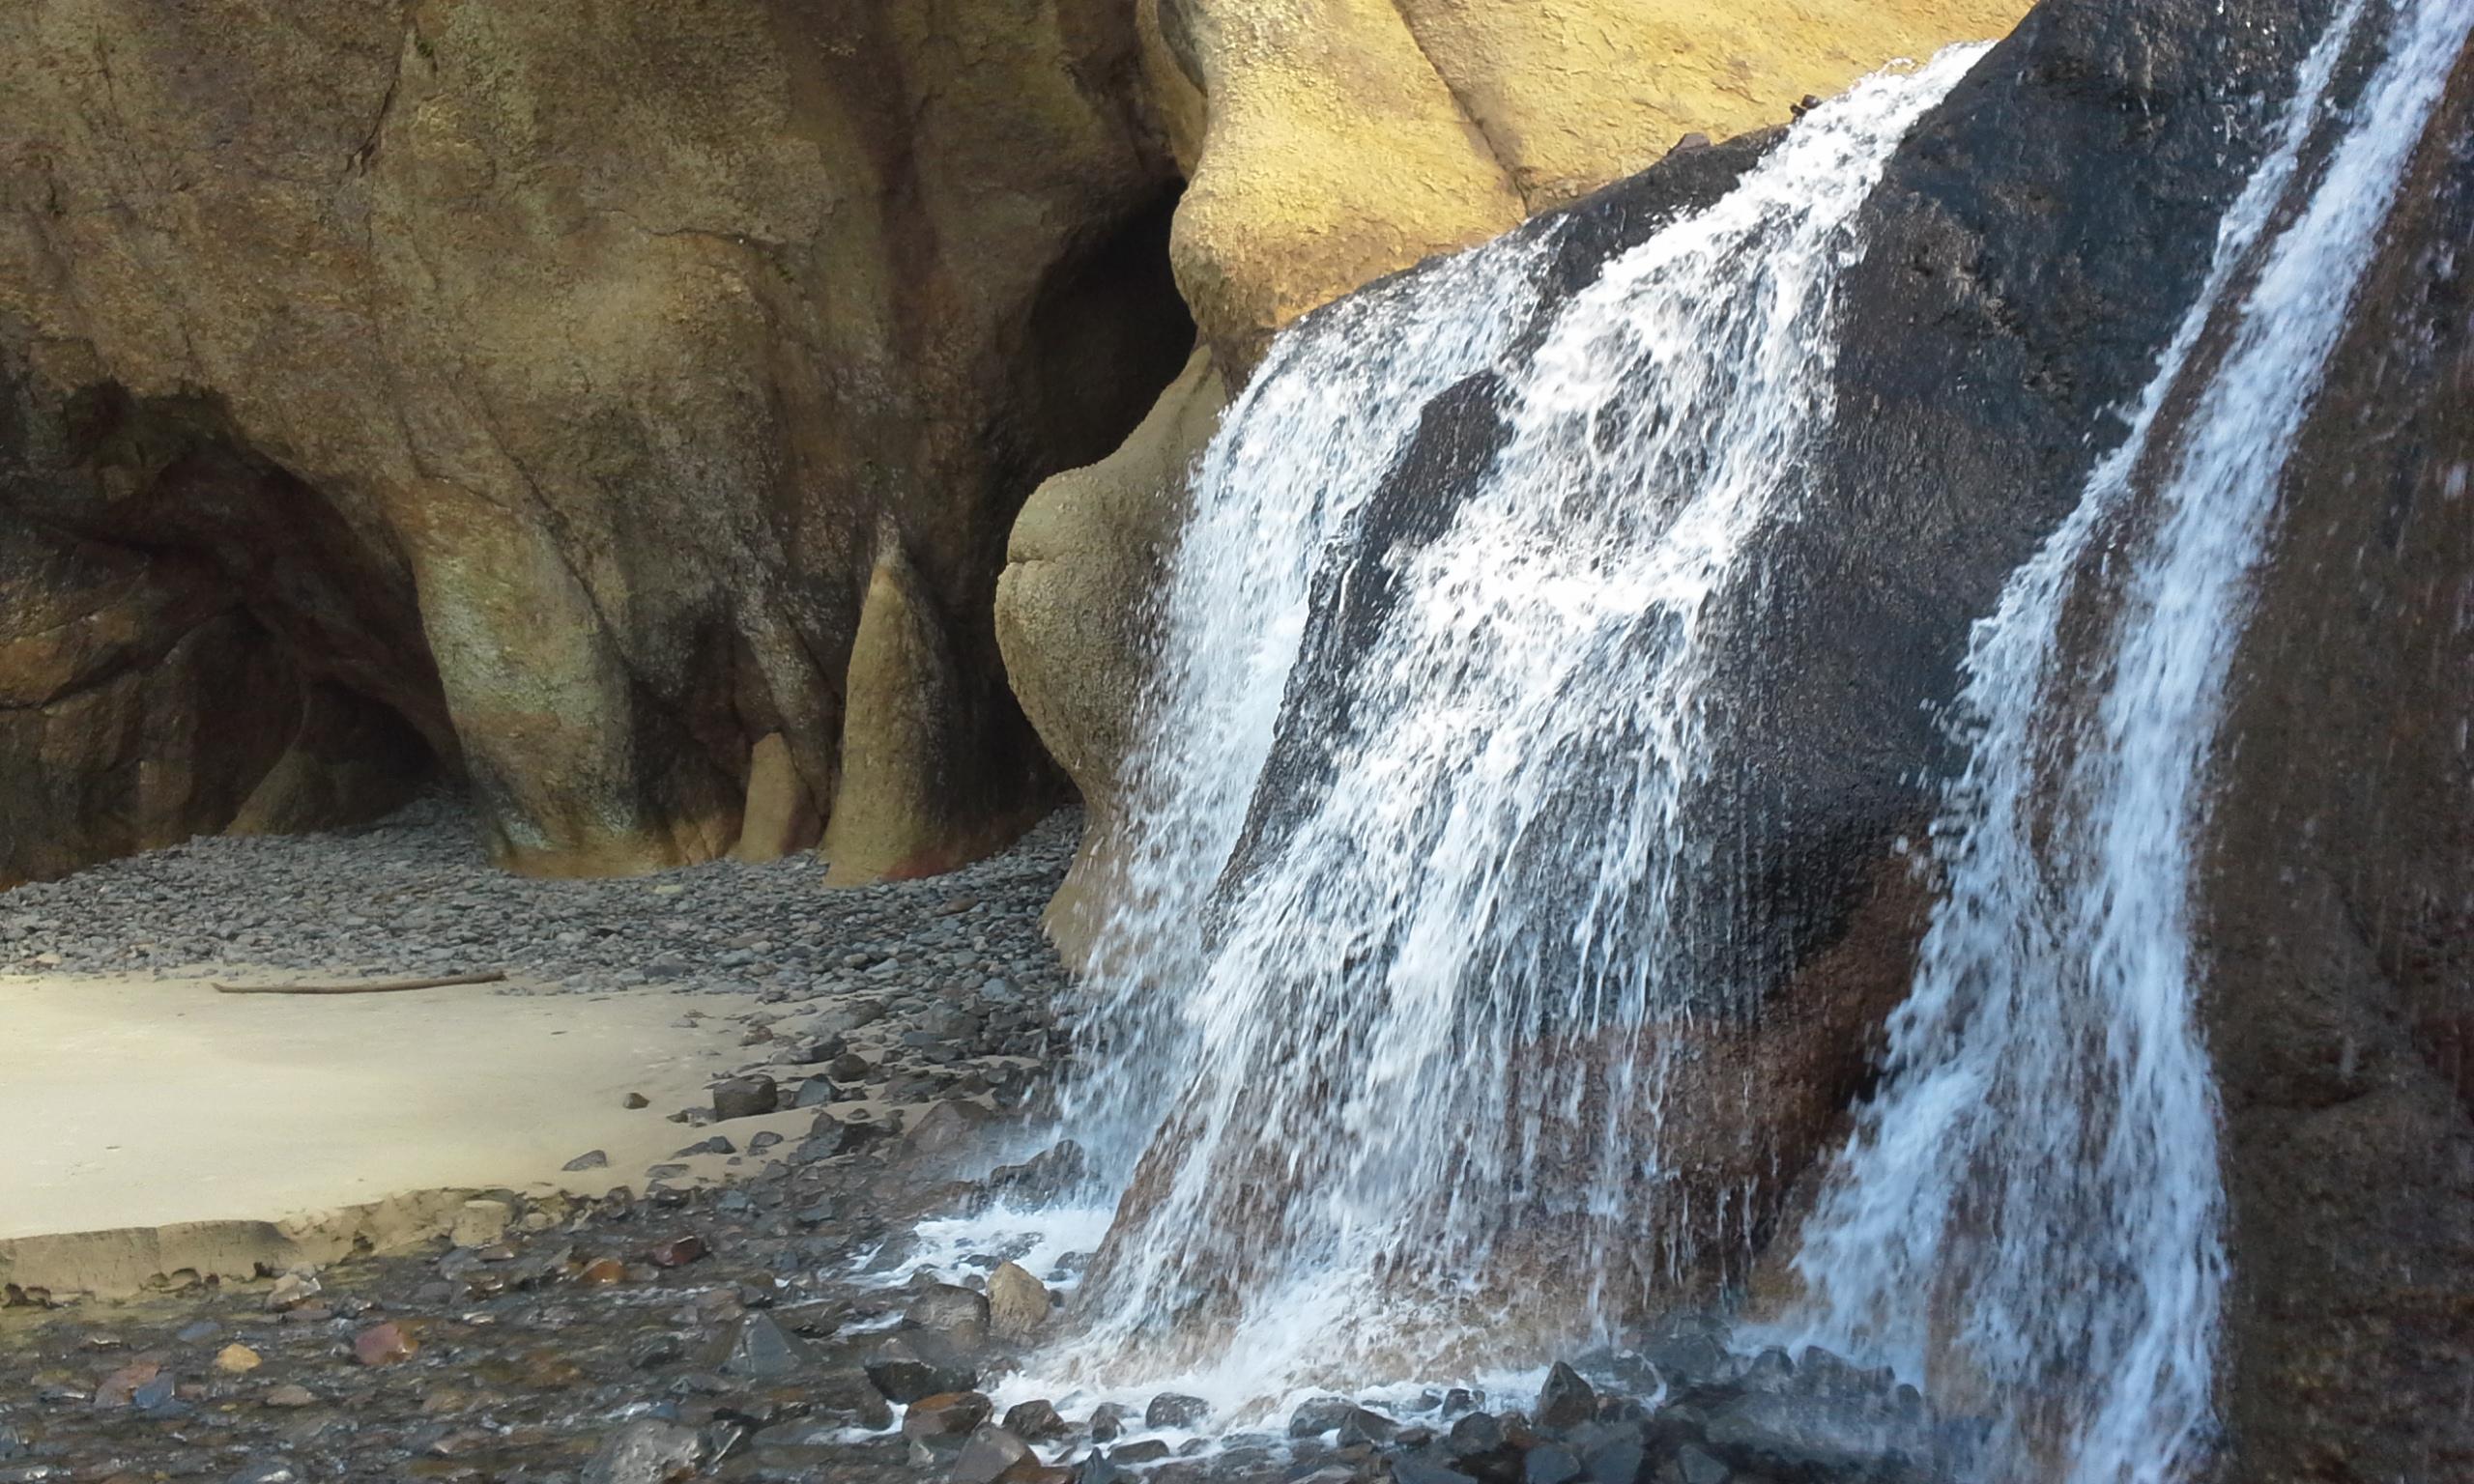 Caves and waterfalls at Hug Point